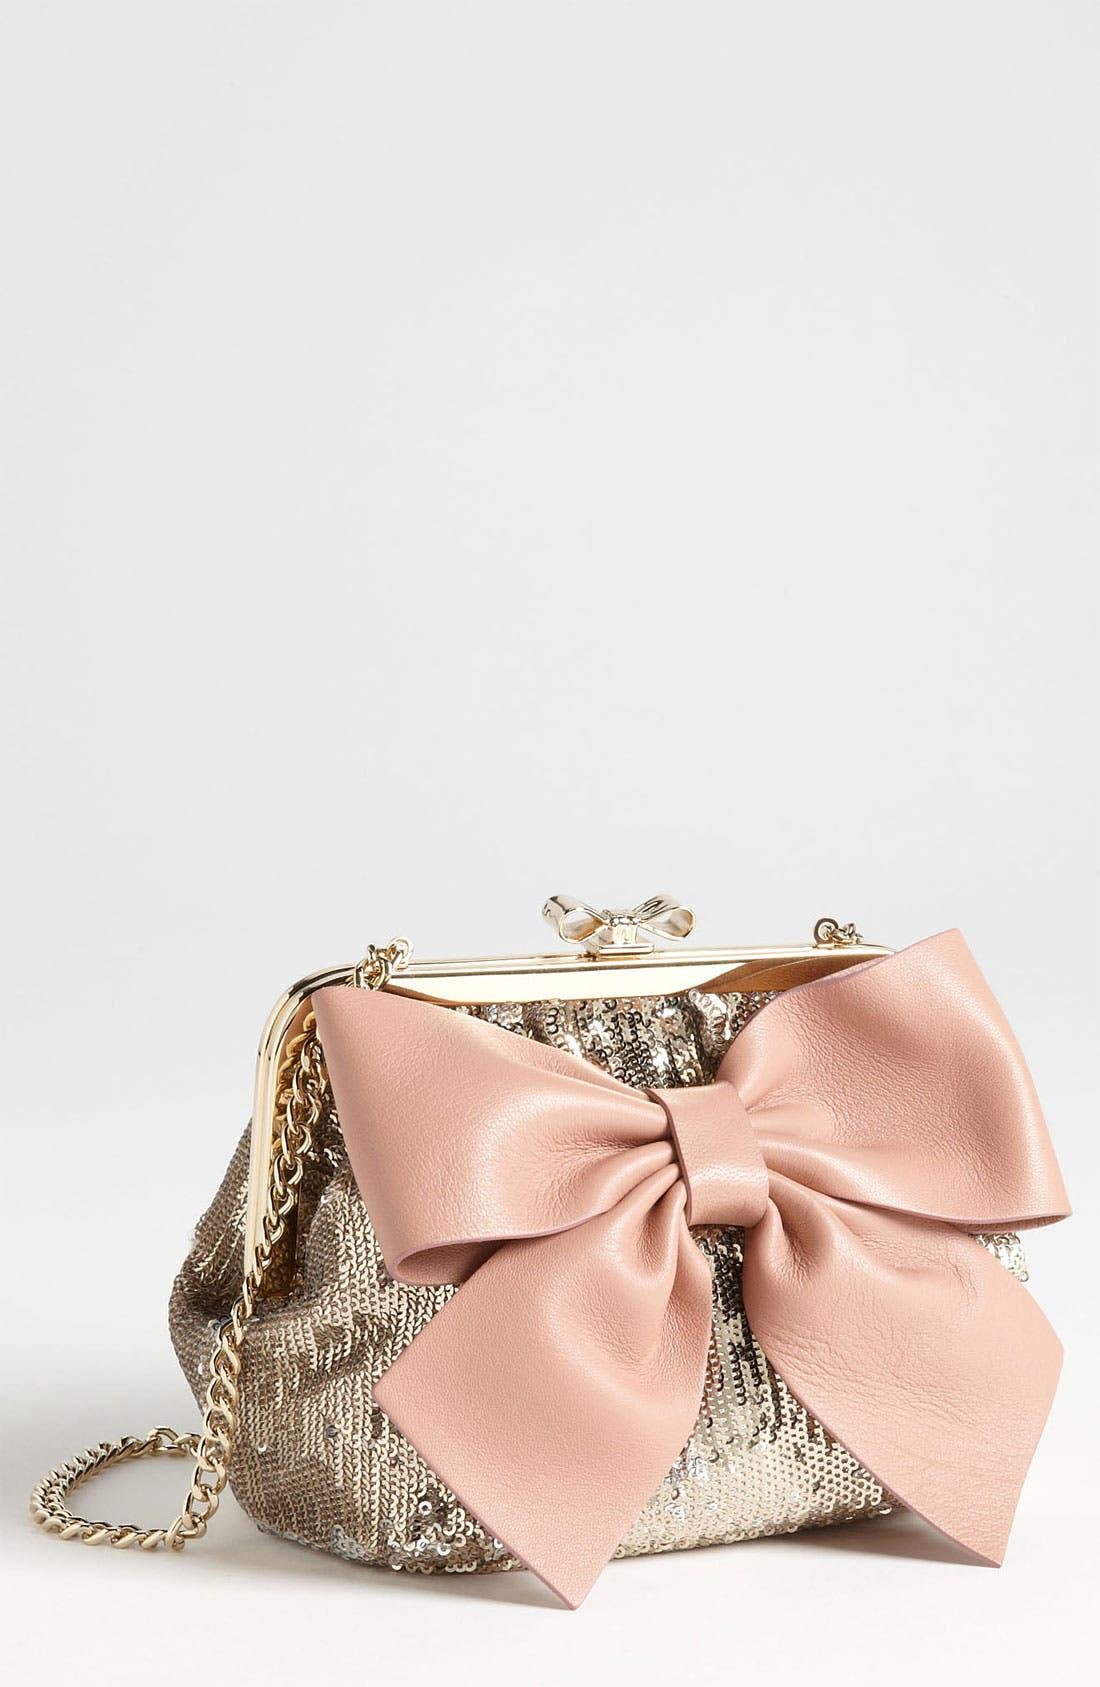 Alternate Image 1 Selected - RED Valentino 'Sequin Bow - Small' Frame Shoulder Bag